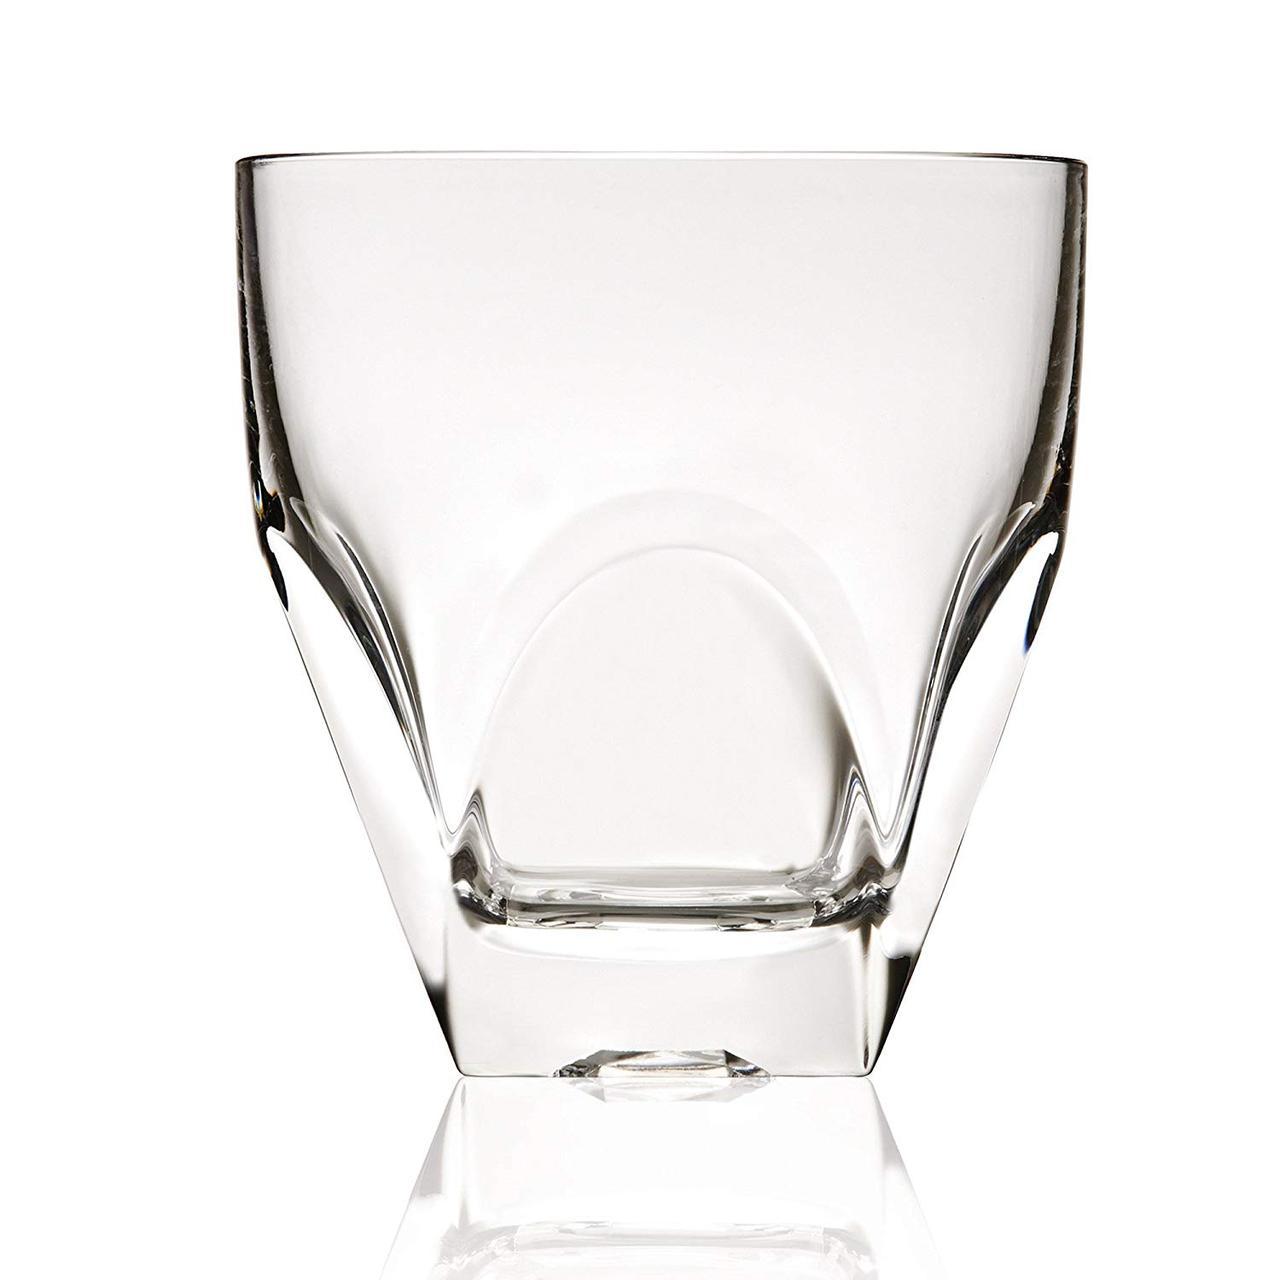 Набор стаканов для виски RCR Diamante 328 мл 6 шт 250210